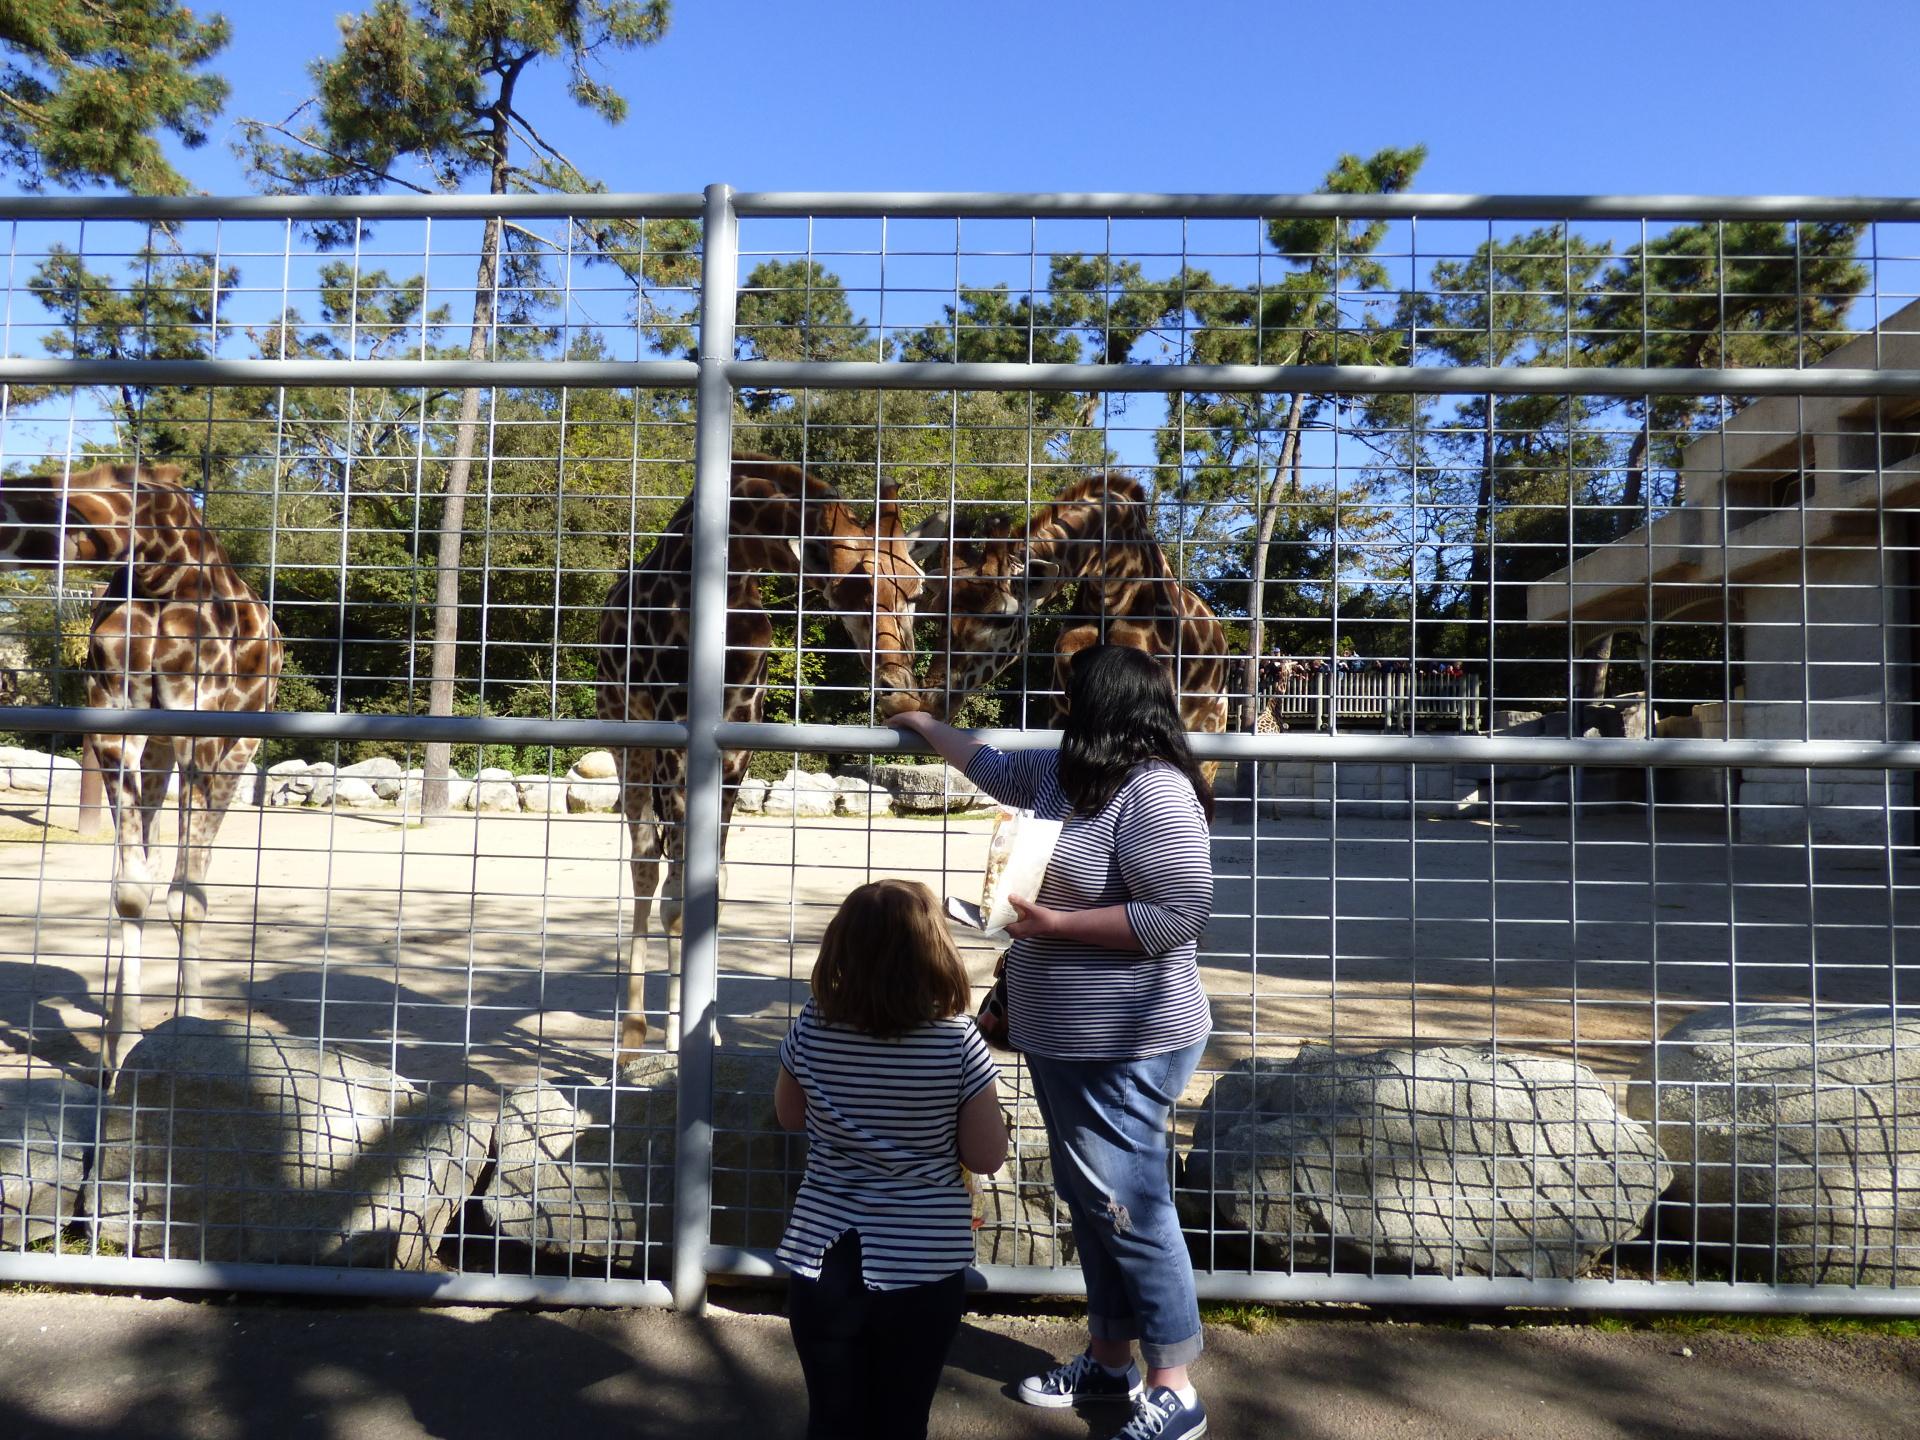 A day out at La Palmyre Zoo, Royan